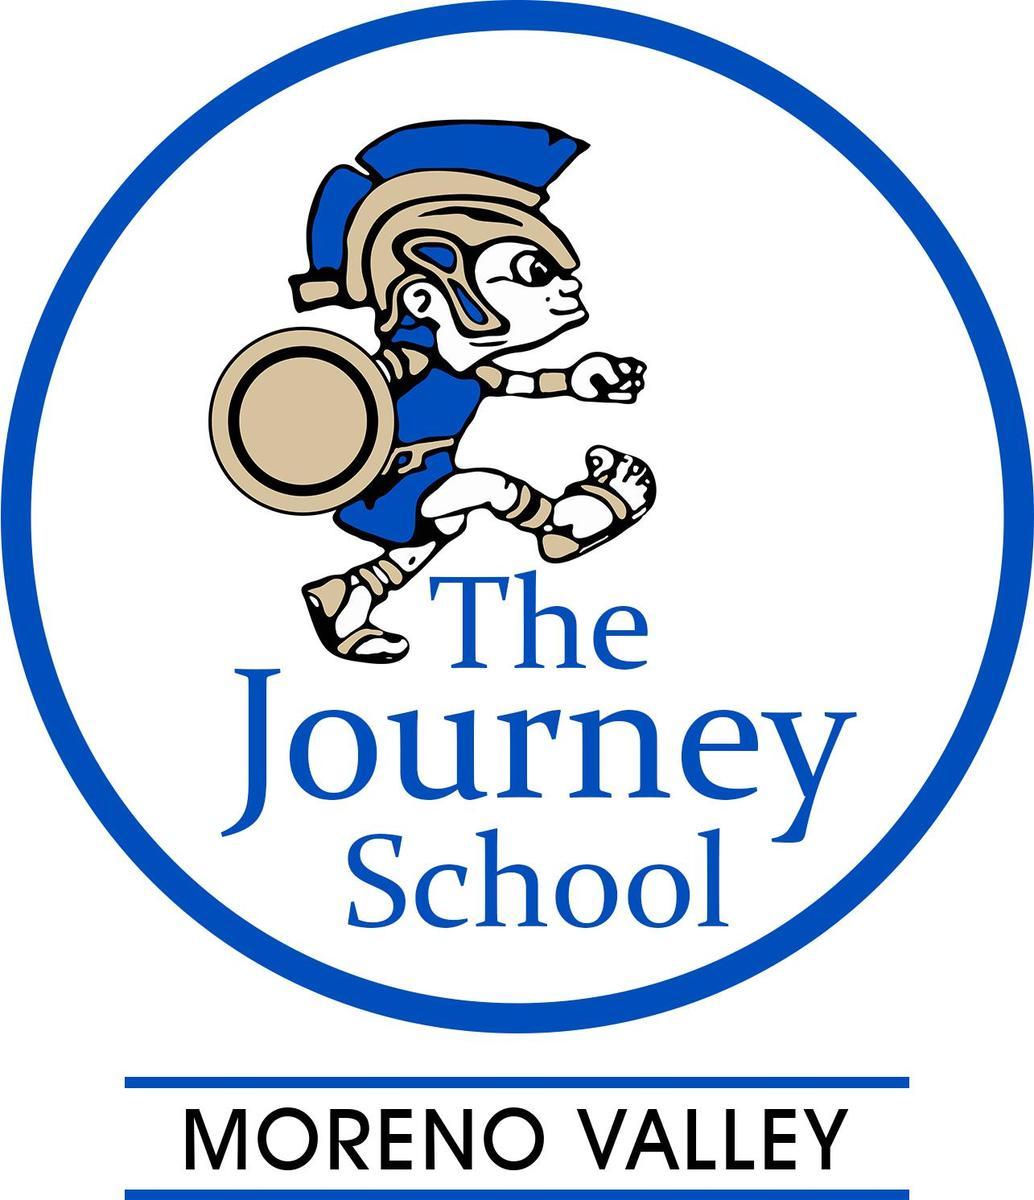 The Journey School